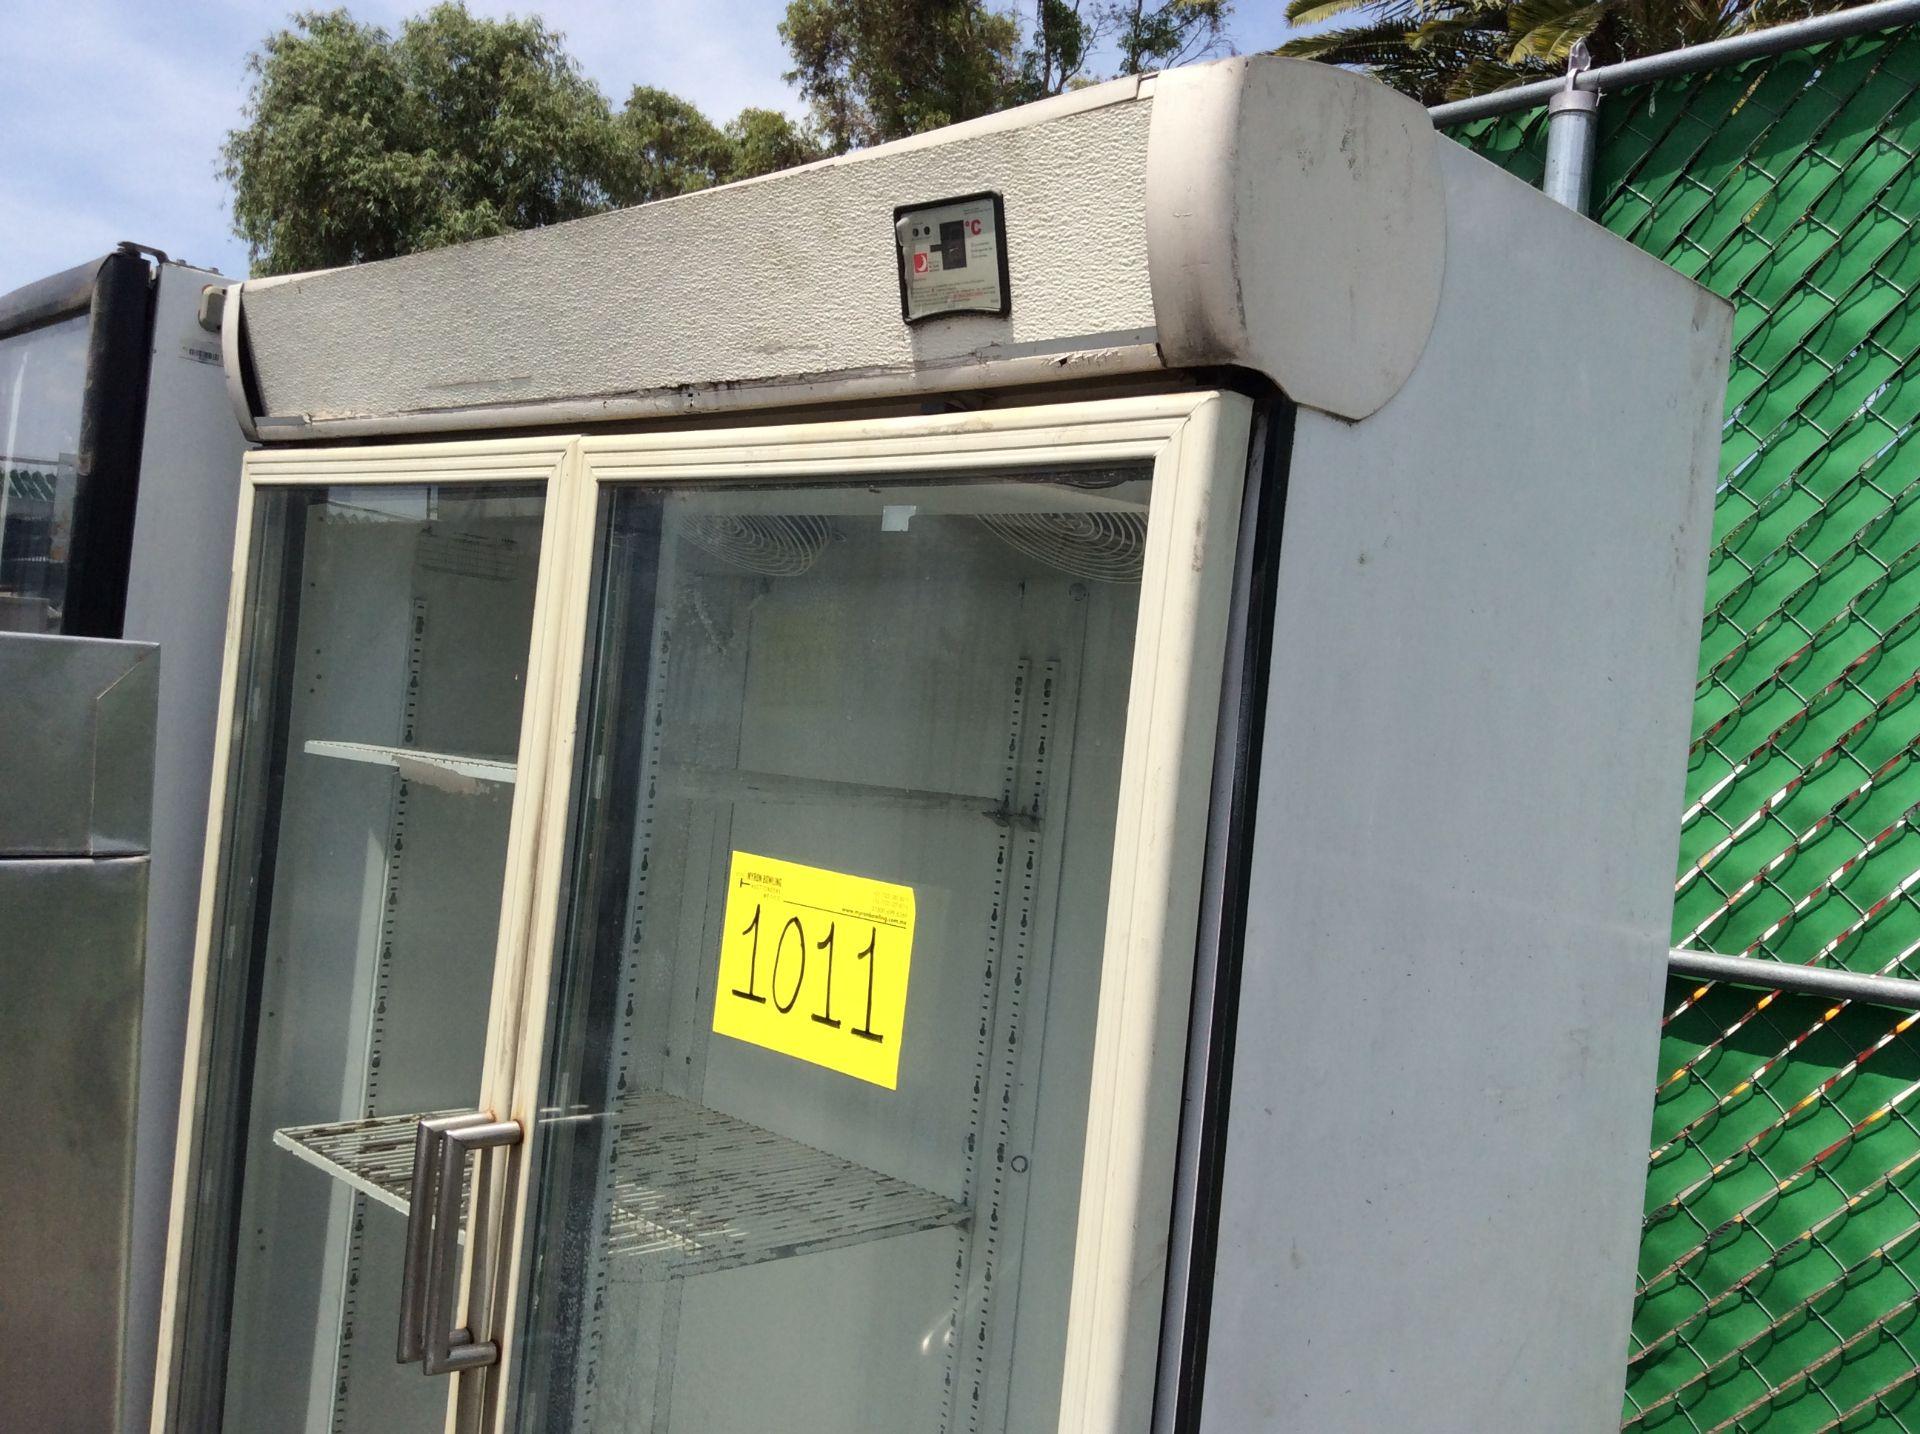 1 Ojeda refrigerator of double glass door model RV2P36 serial number 0636323-34305 120V - Image 6 of 14